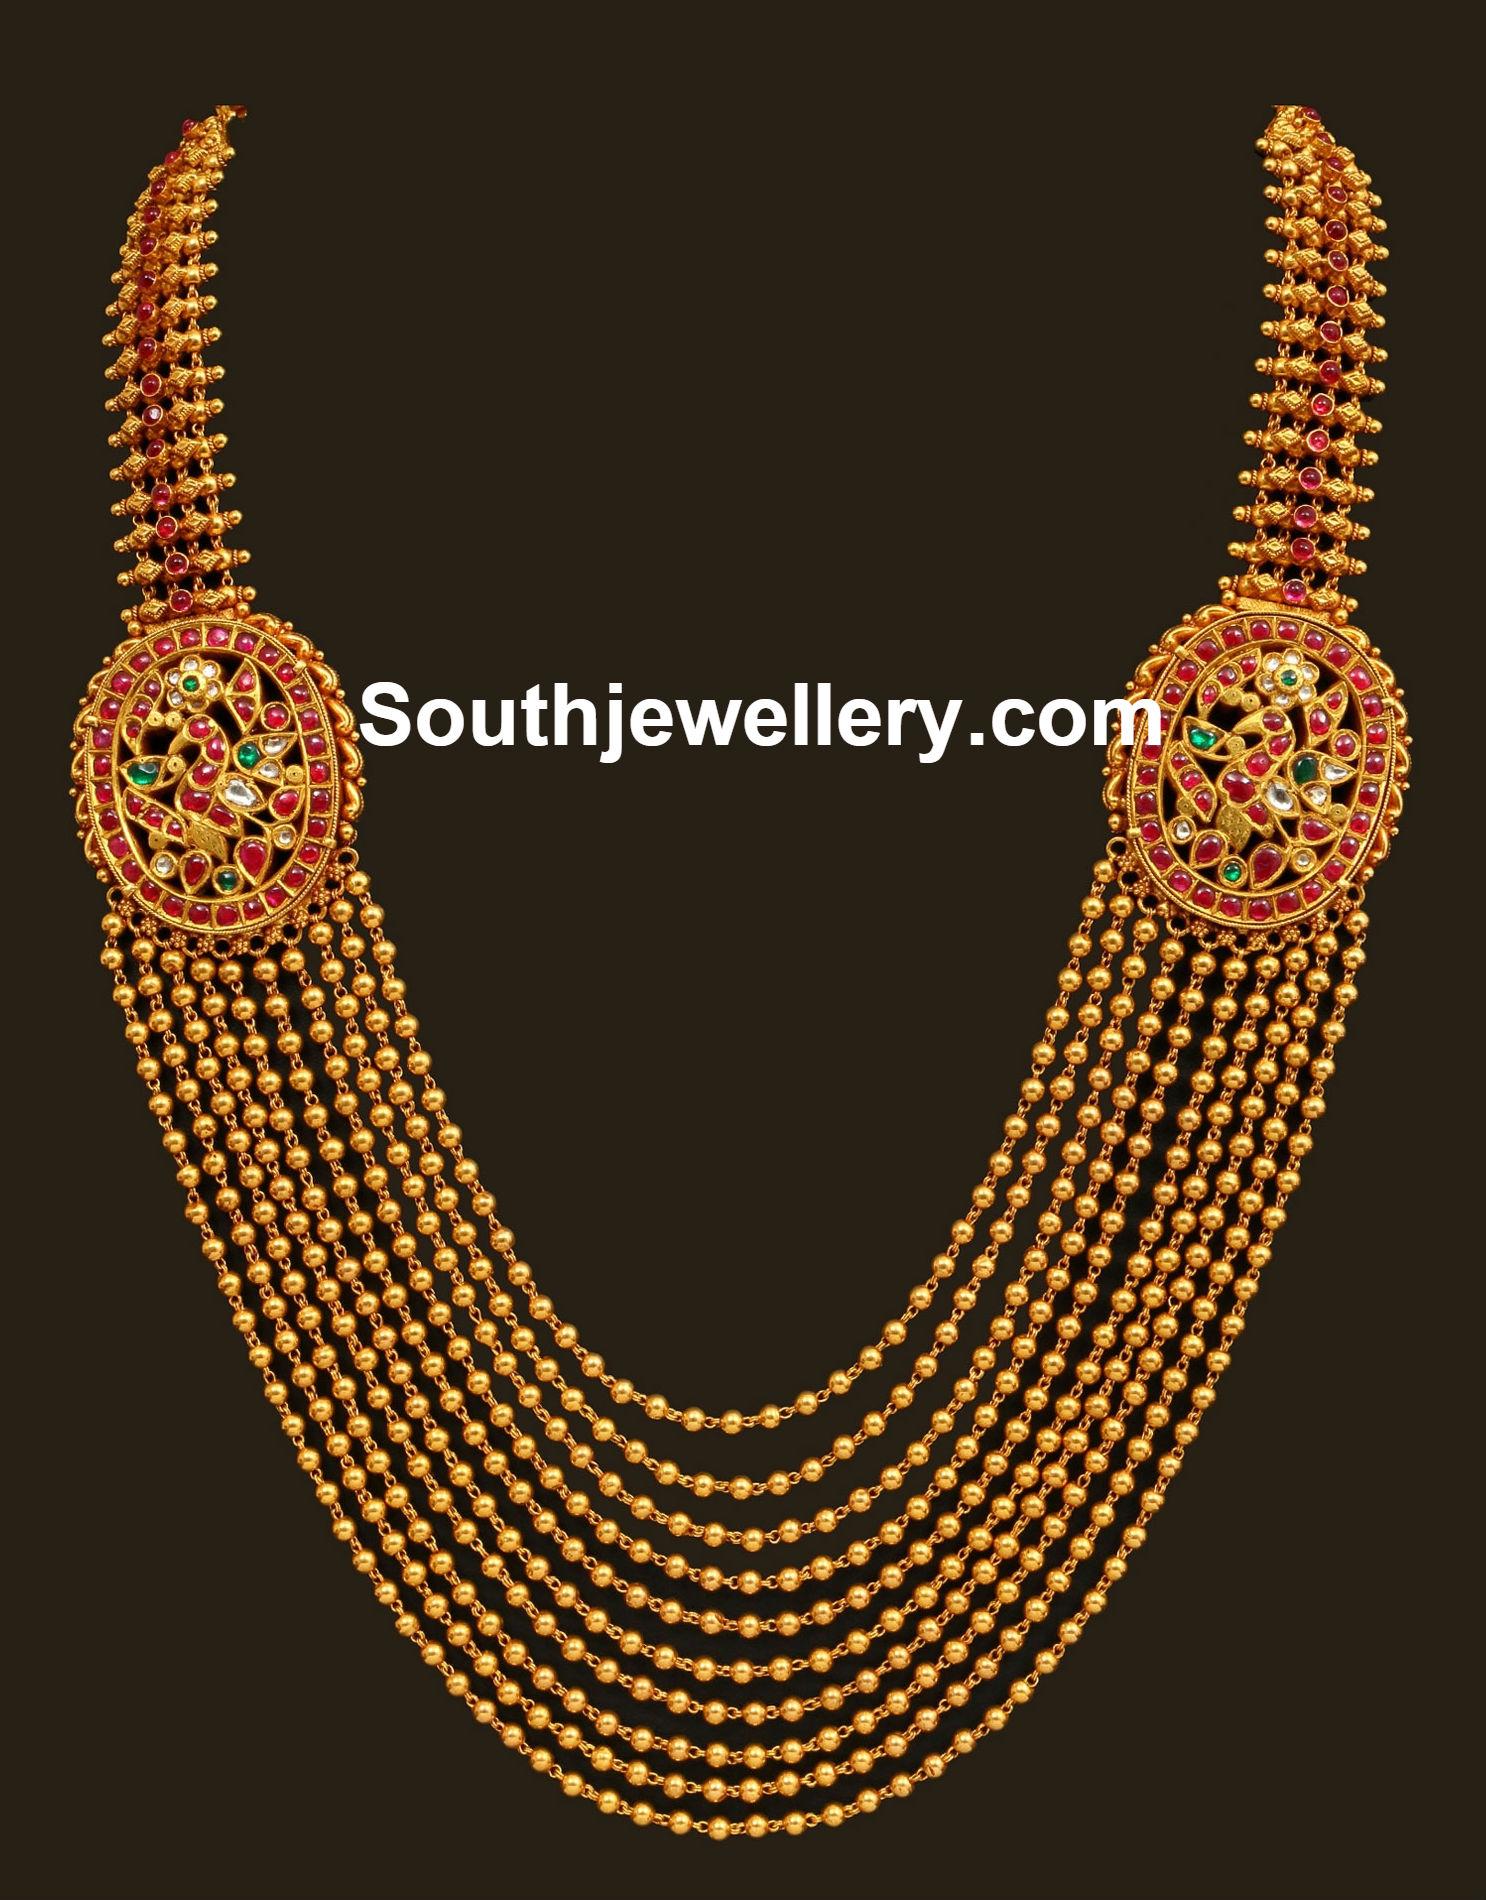 Suhasini in gundla haram jewellery designs - Gorgeous 10 Line Chandraharam